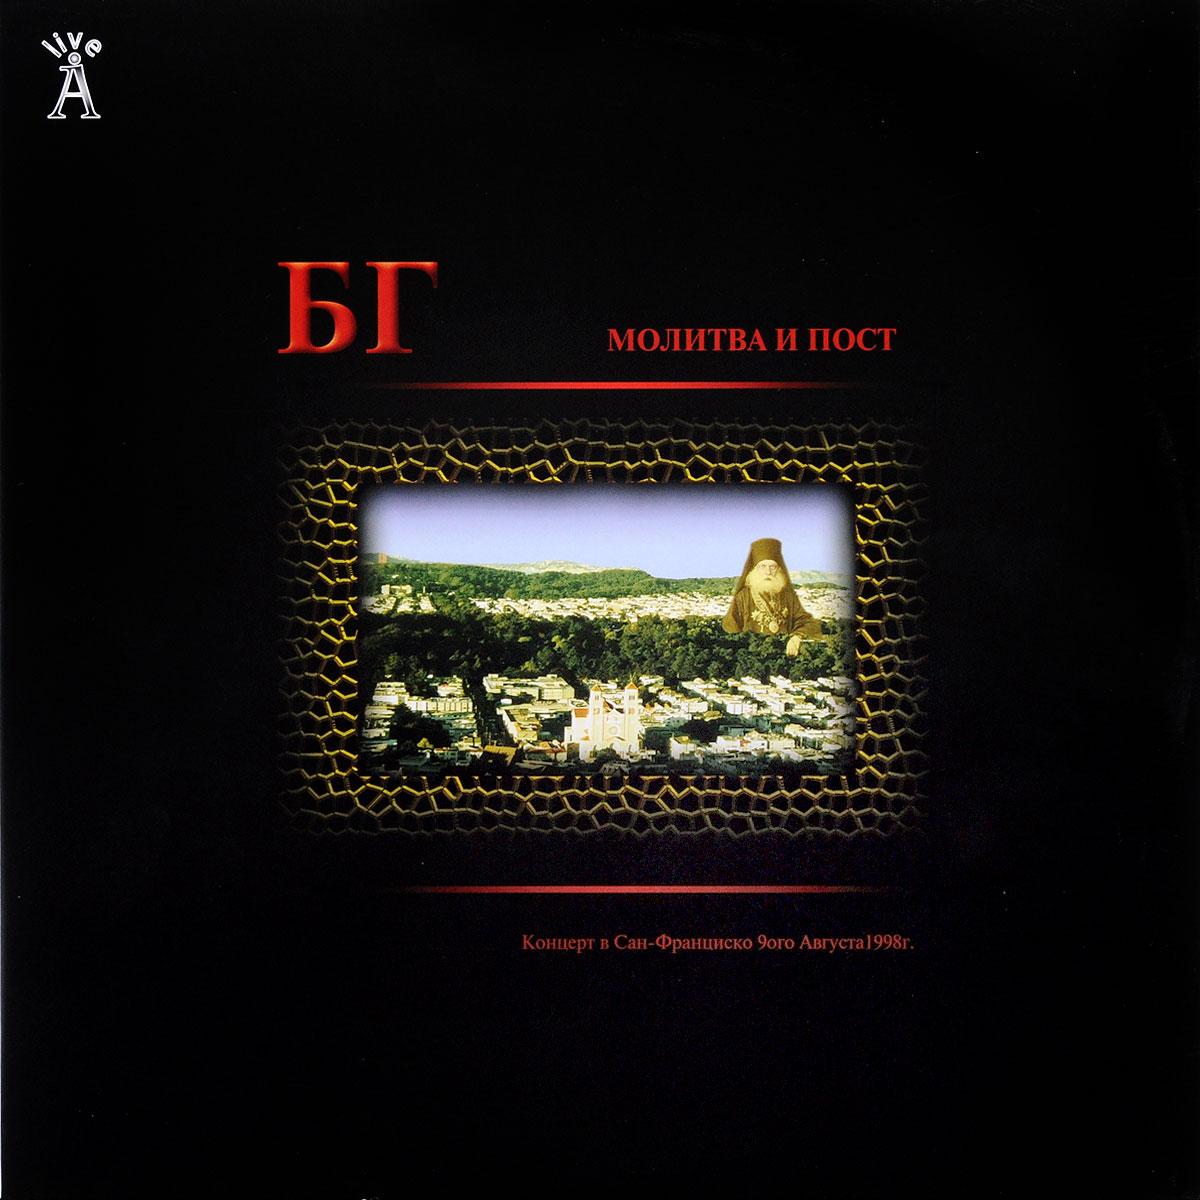 Борис Гребенщиков БГ. Молитва и пост (2 LP) lp a640c